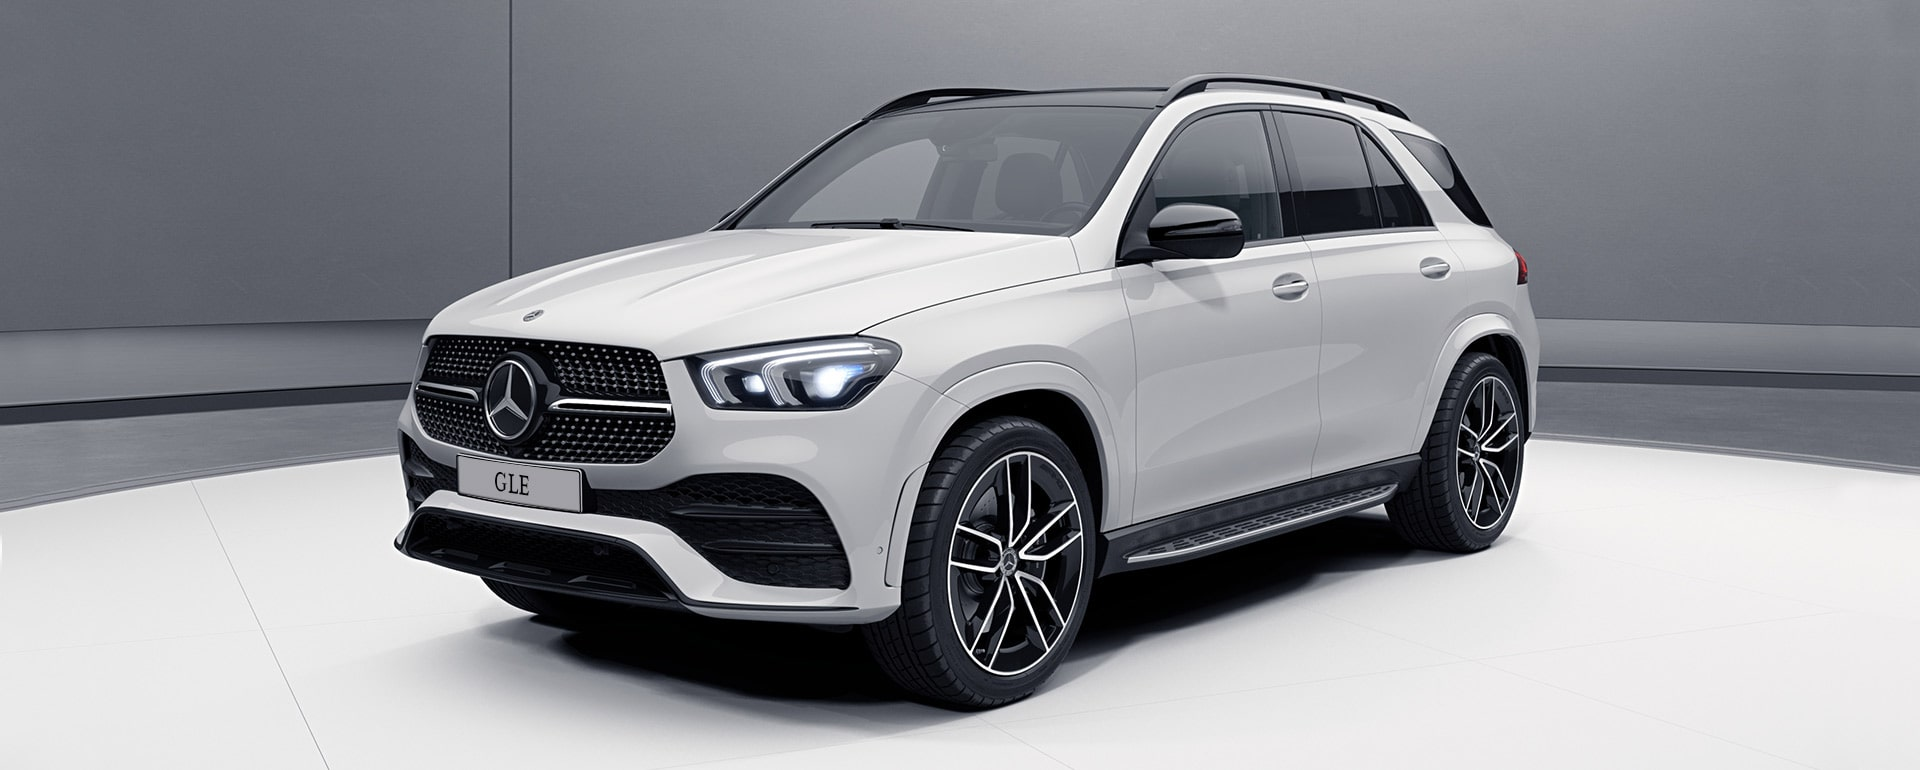 GLE SUV - Blanca